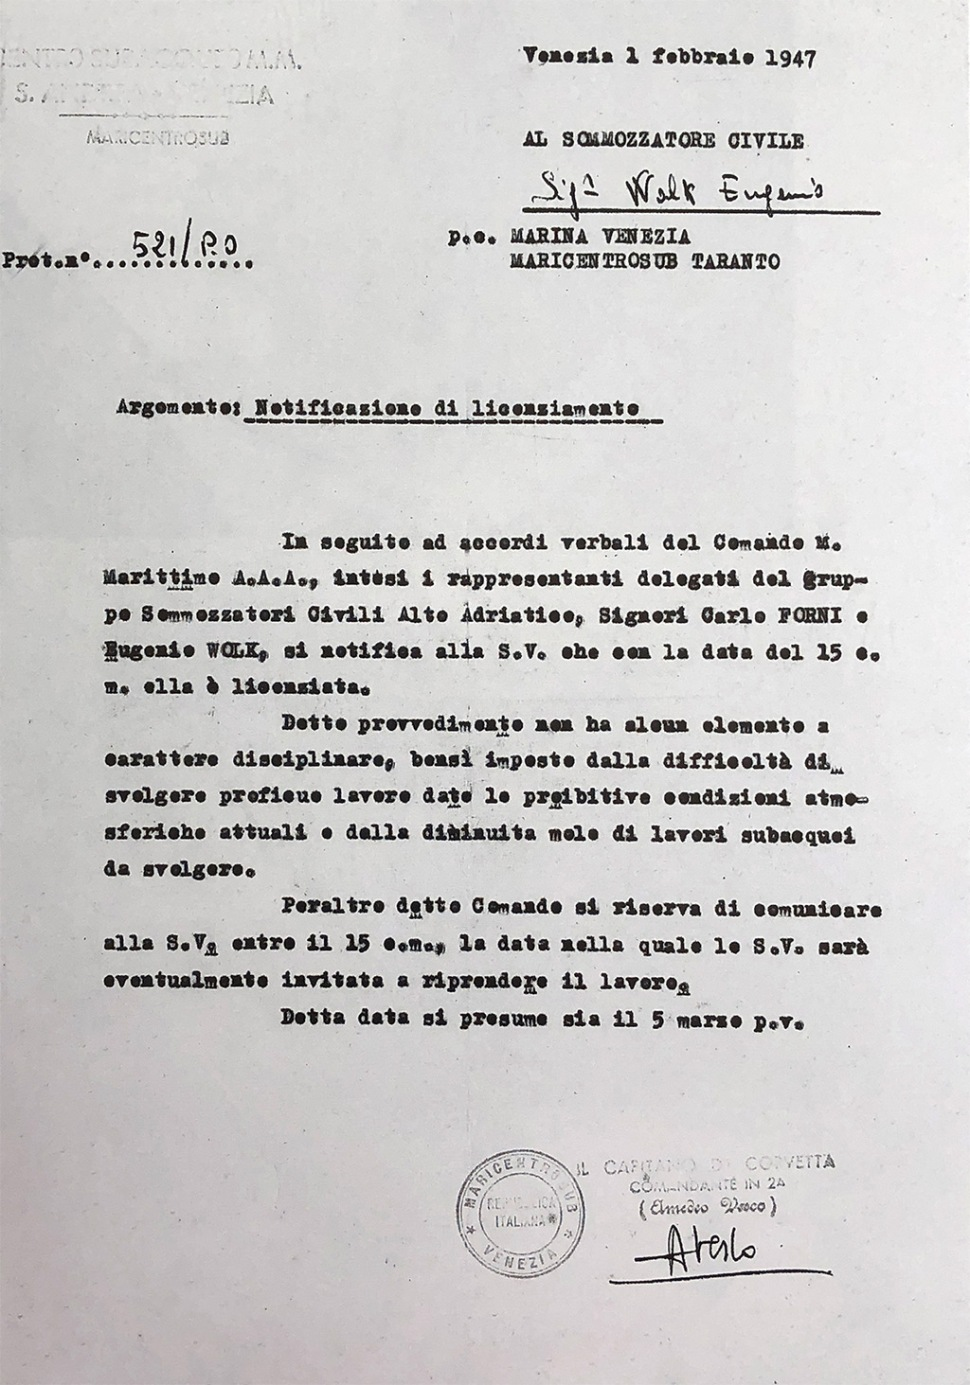 190218-letter-maricentrosub-amedeo-vesco-to-eugenio-wolk-1947